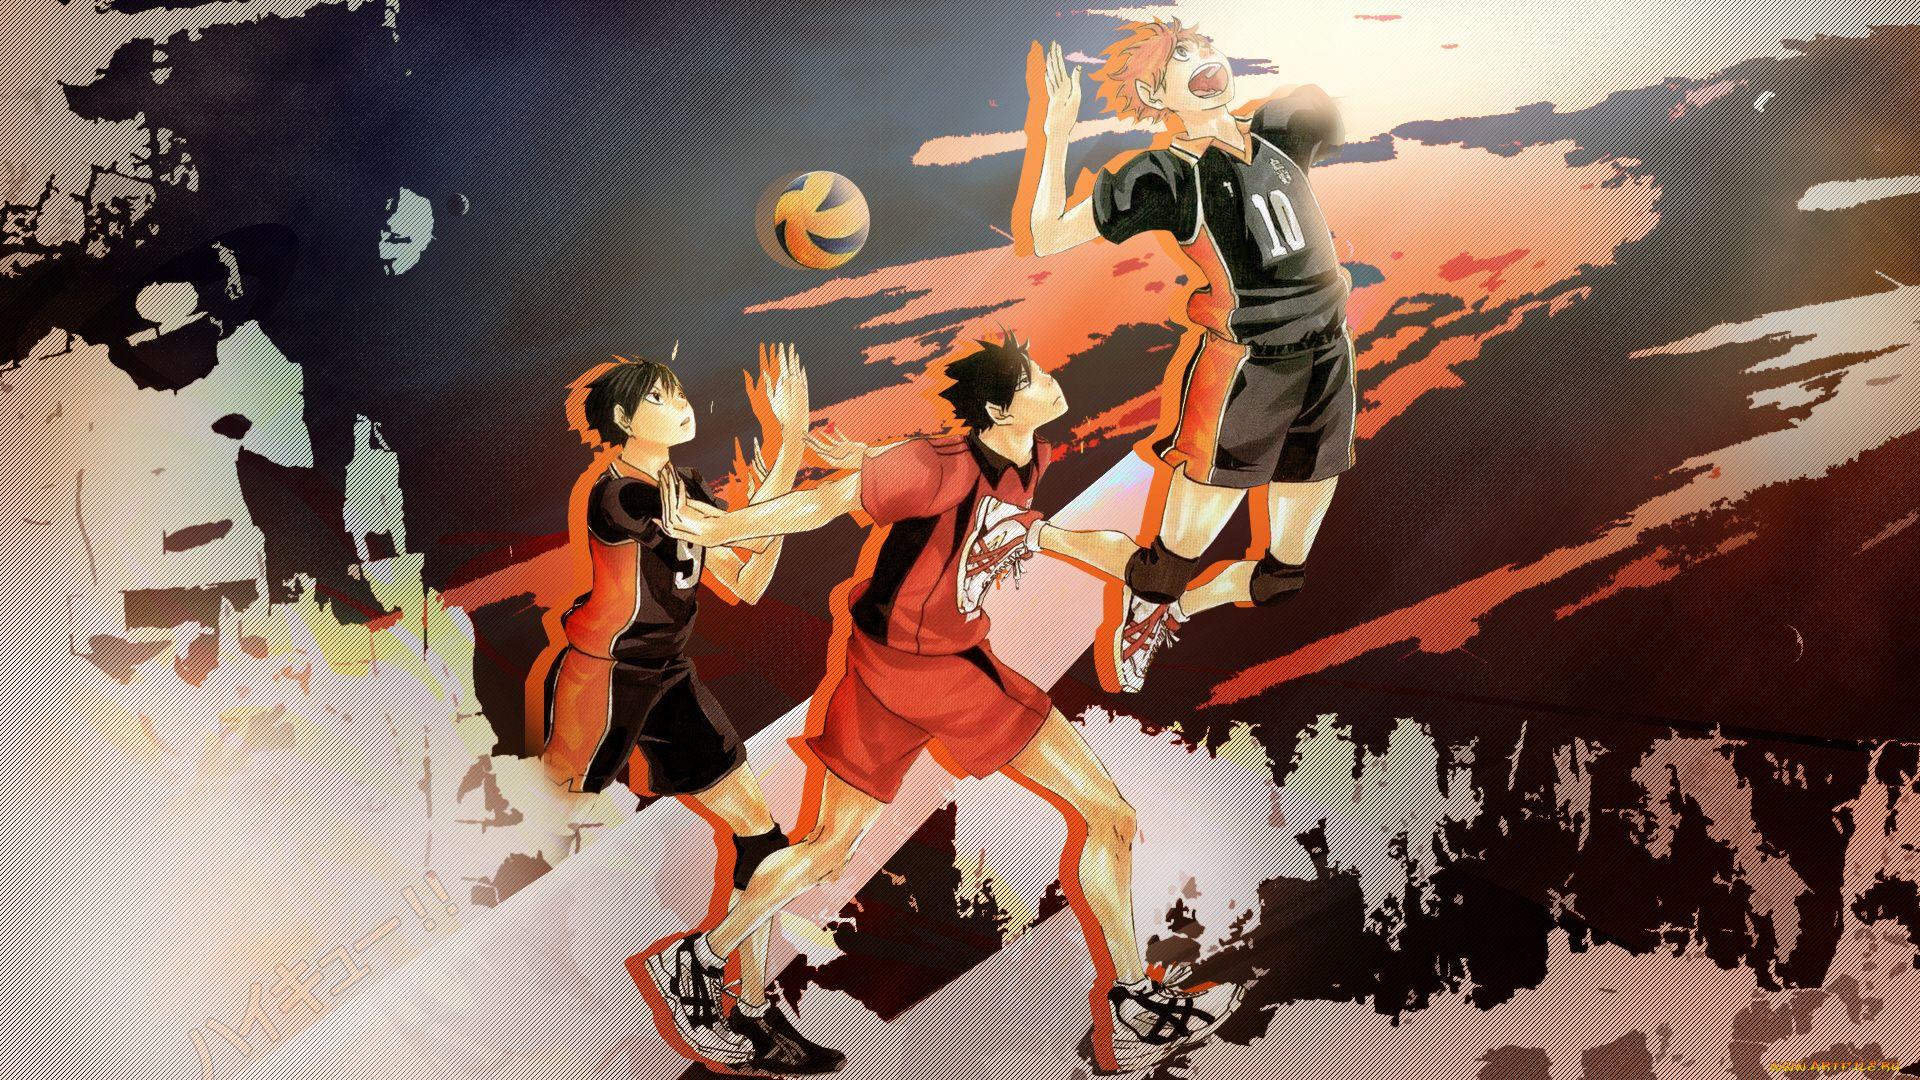 Arts On Anime Volleyball Haikyuu!!